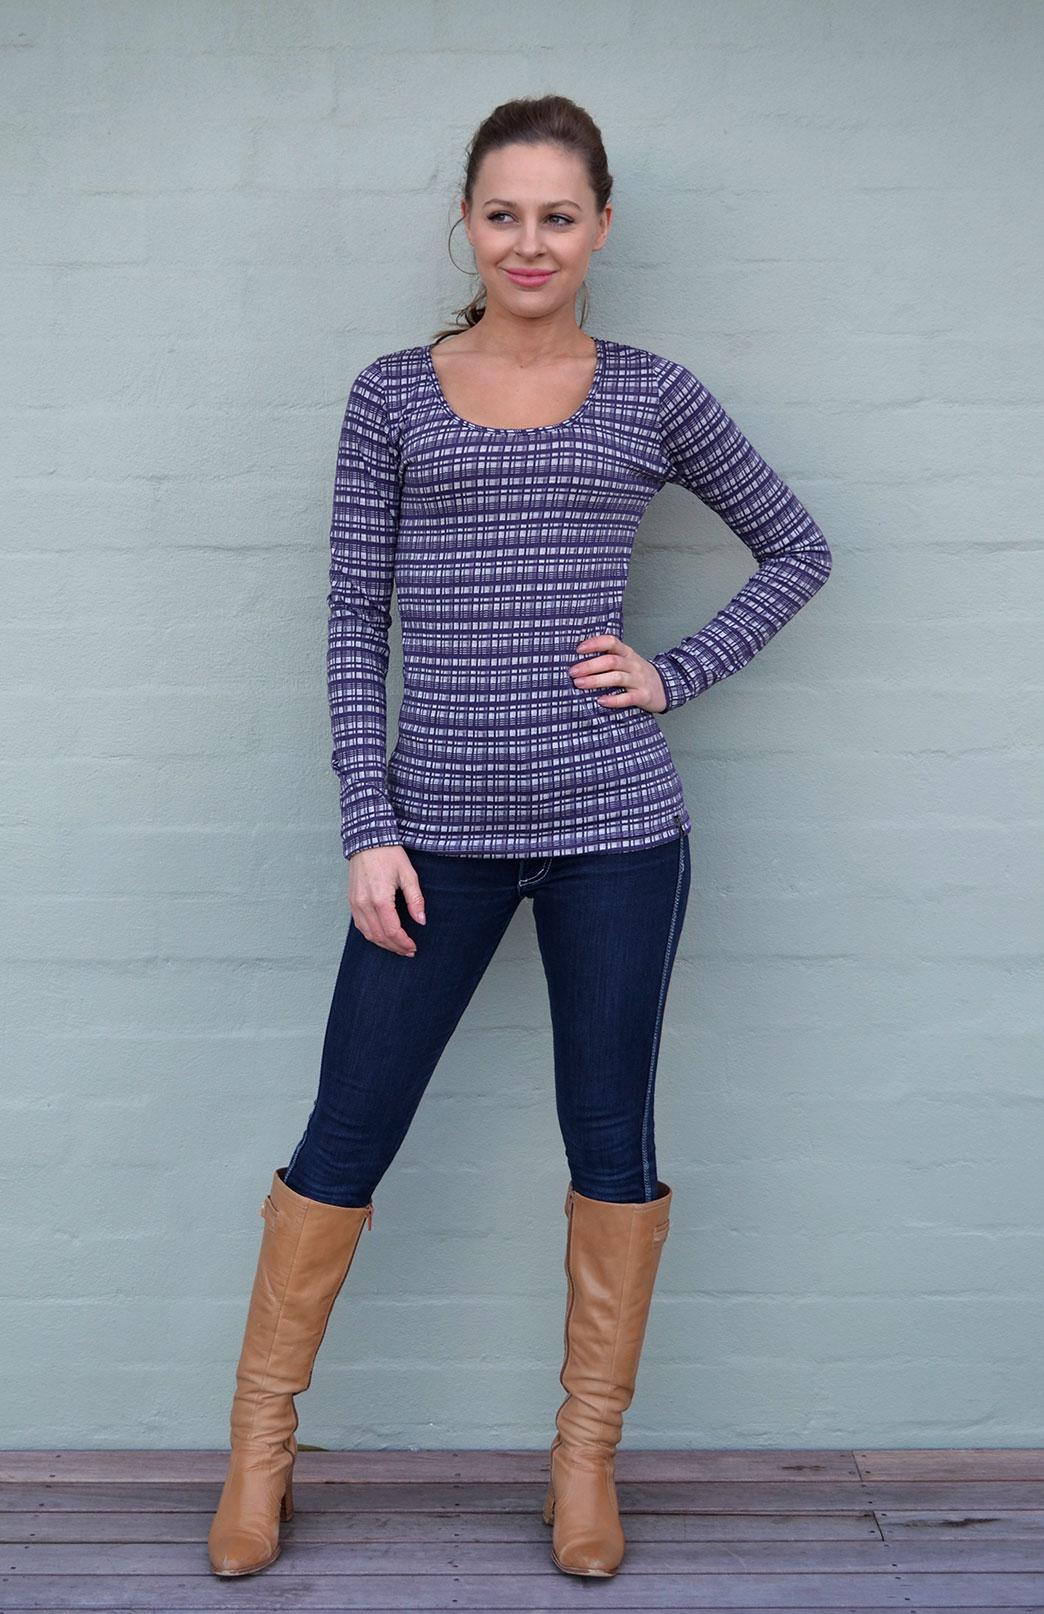 Patterned Scoop Top - Women's Grape Check Patterned Merino Modal Blend Long Sleeve Top - Smitten Merino Tasmania Australia